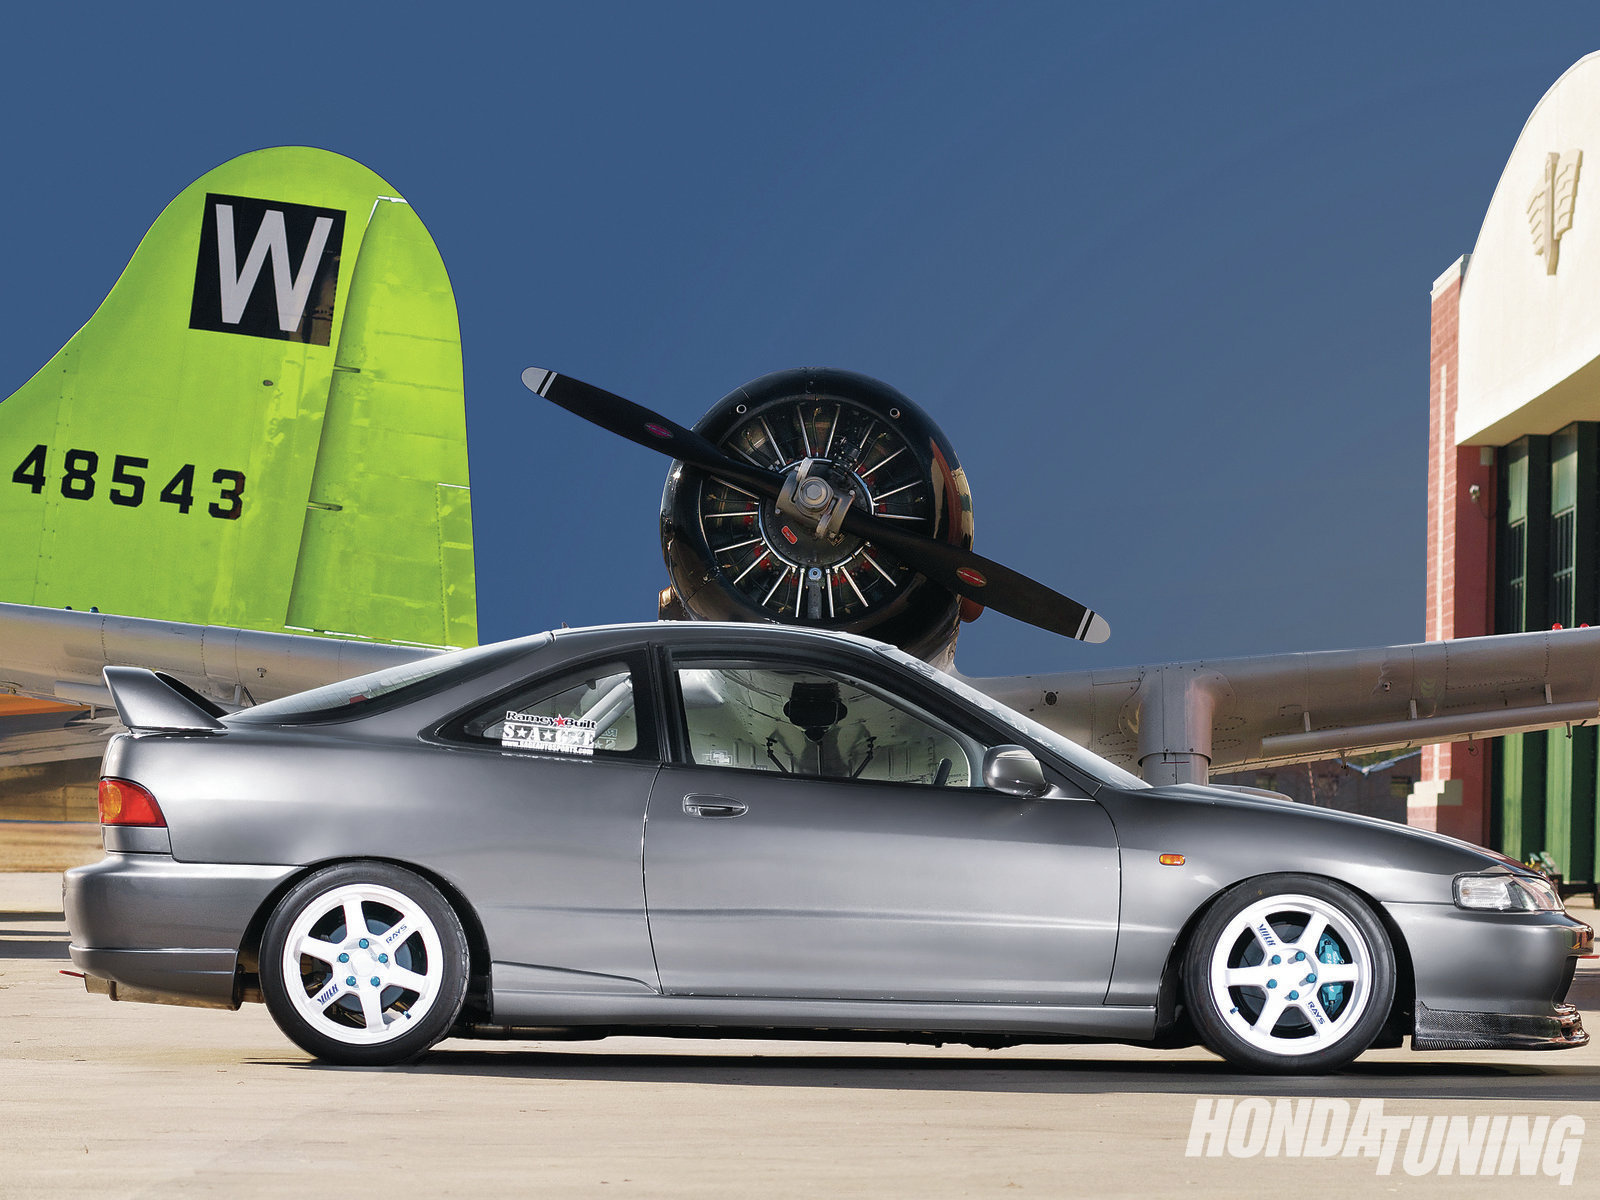 2001 Acura Integra Gs R Born Again Honda Tuning Magazine